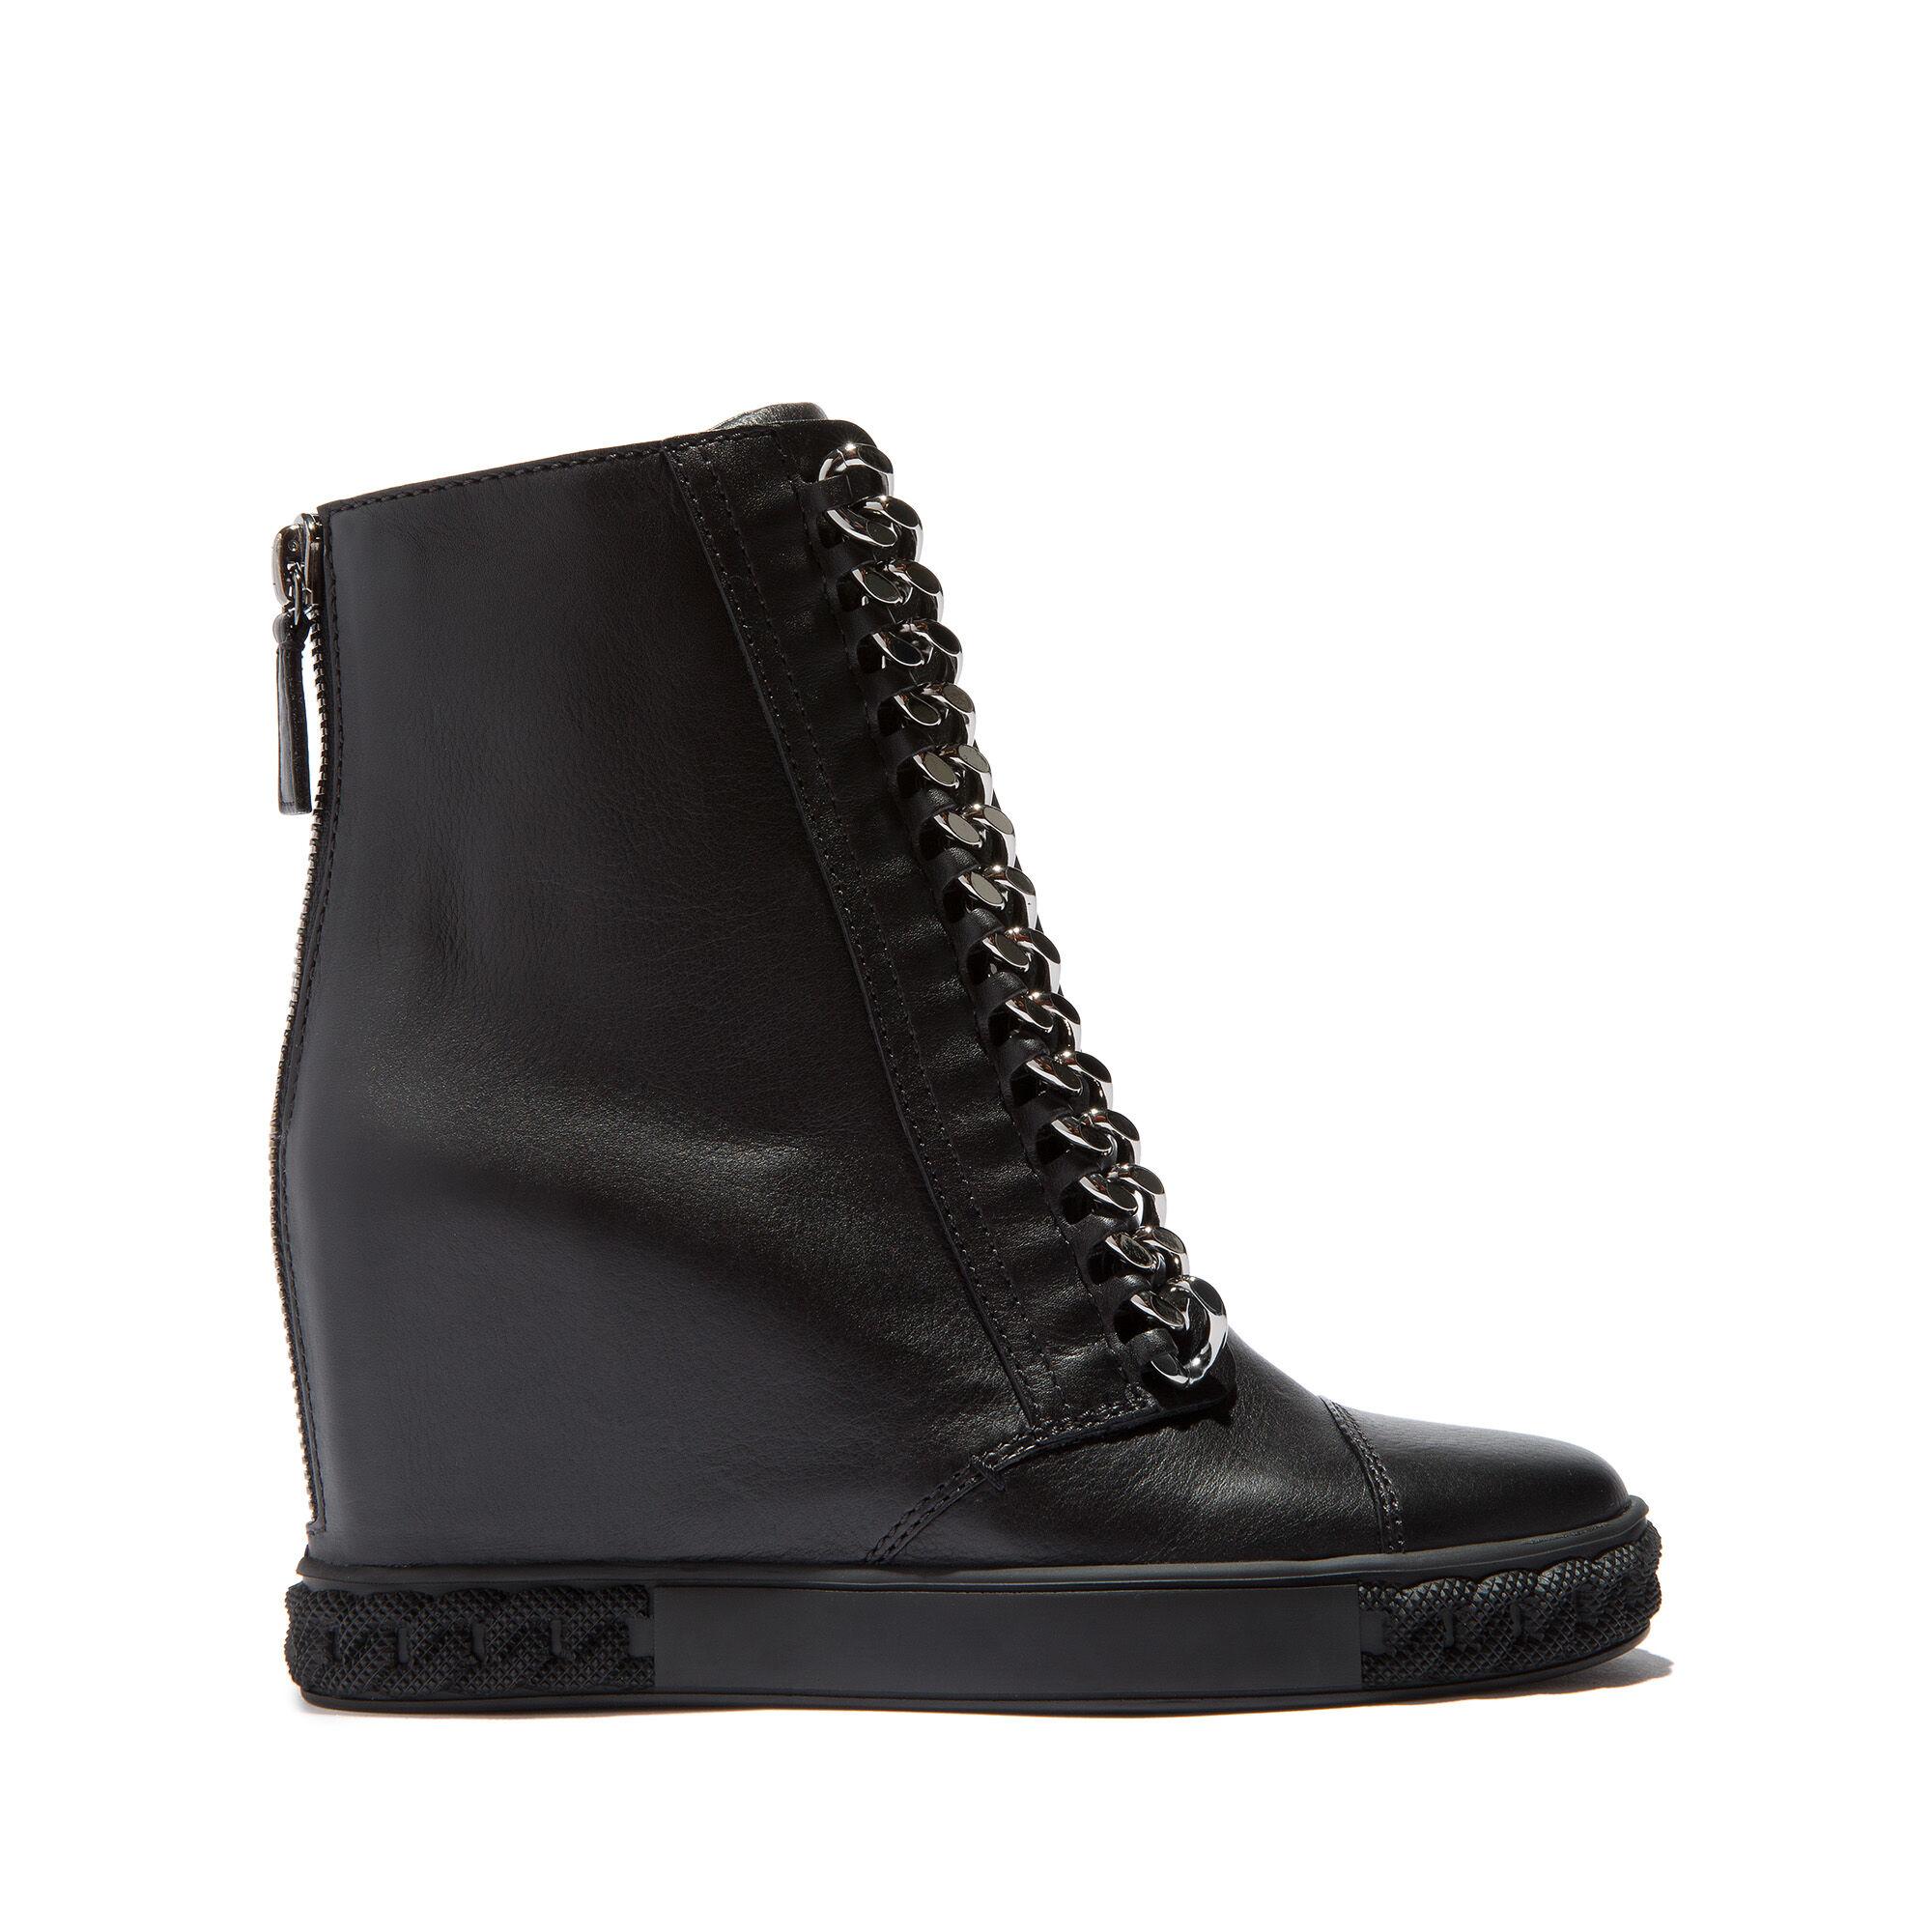 Pour Femme De Sneakers Luxe Casadei AEvvgq